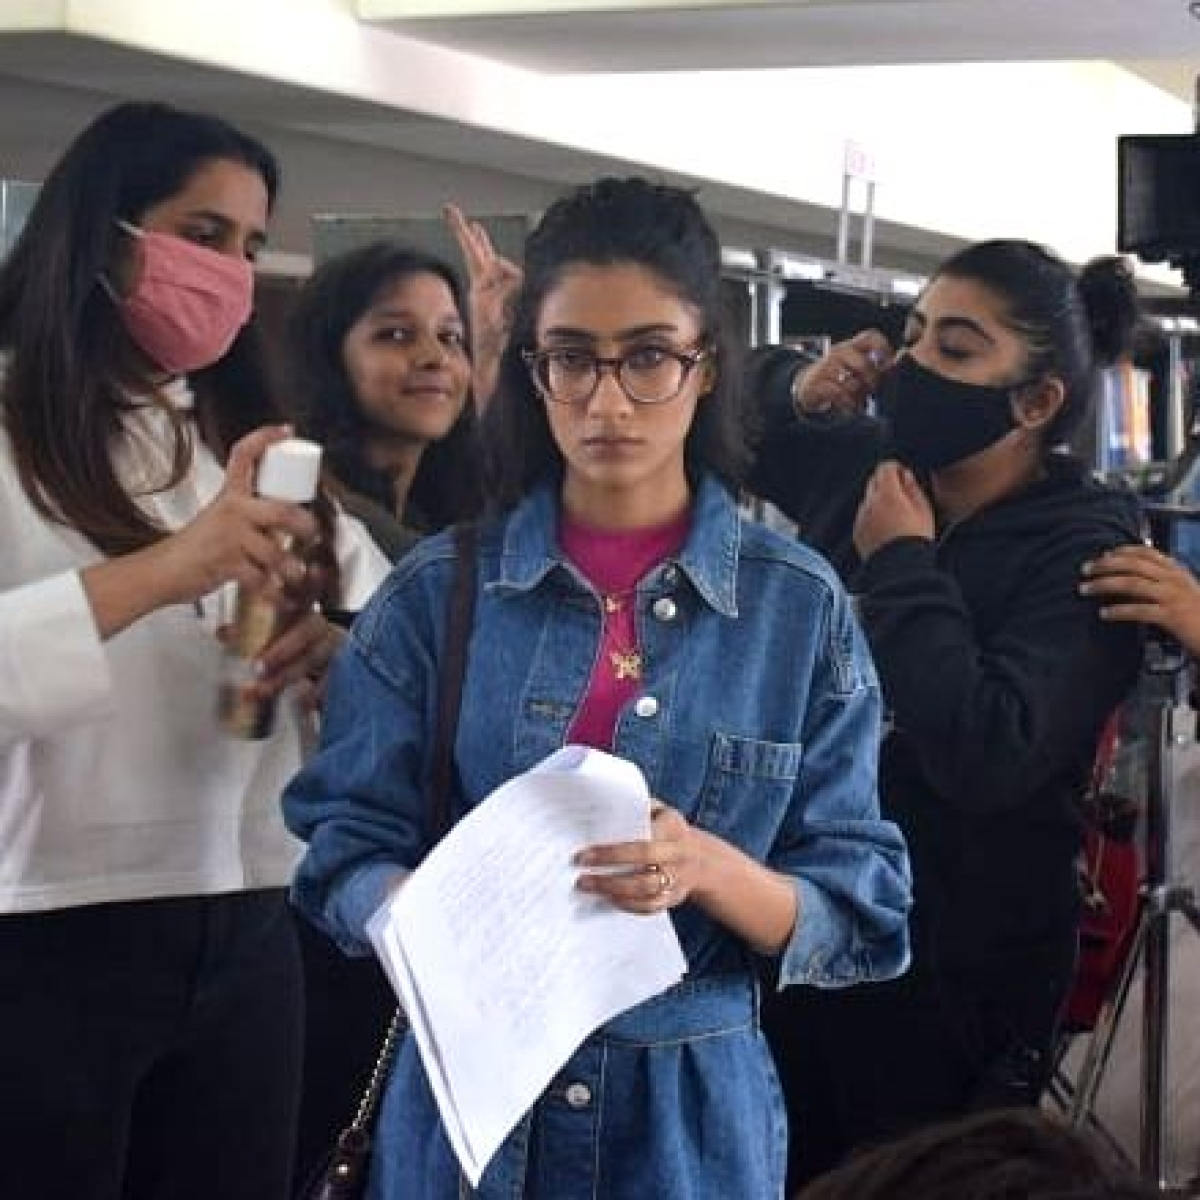 Sushmita Sen's daughter Renee calls out haters who 'judge, gossip and misunderstand'